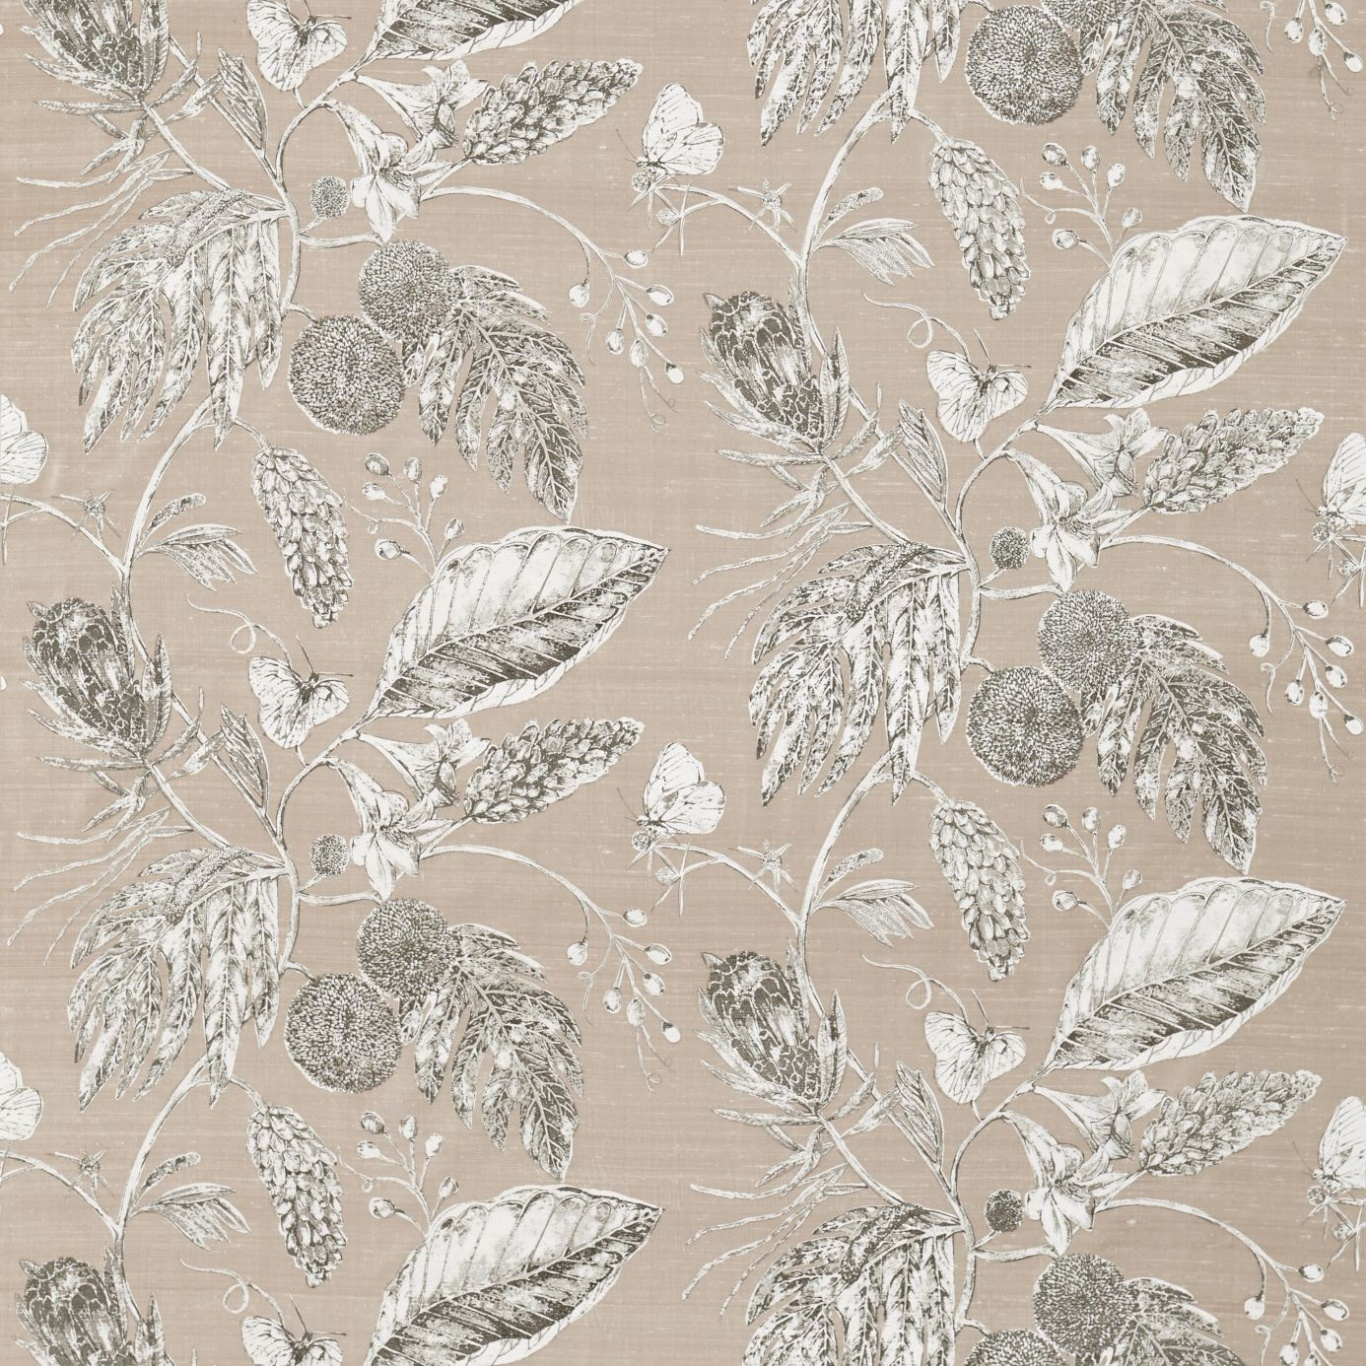 Image of Harlequin Amborella Pebble Curtain Fabric 120421